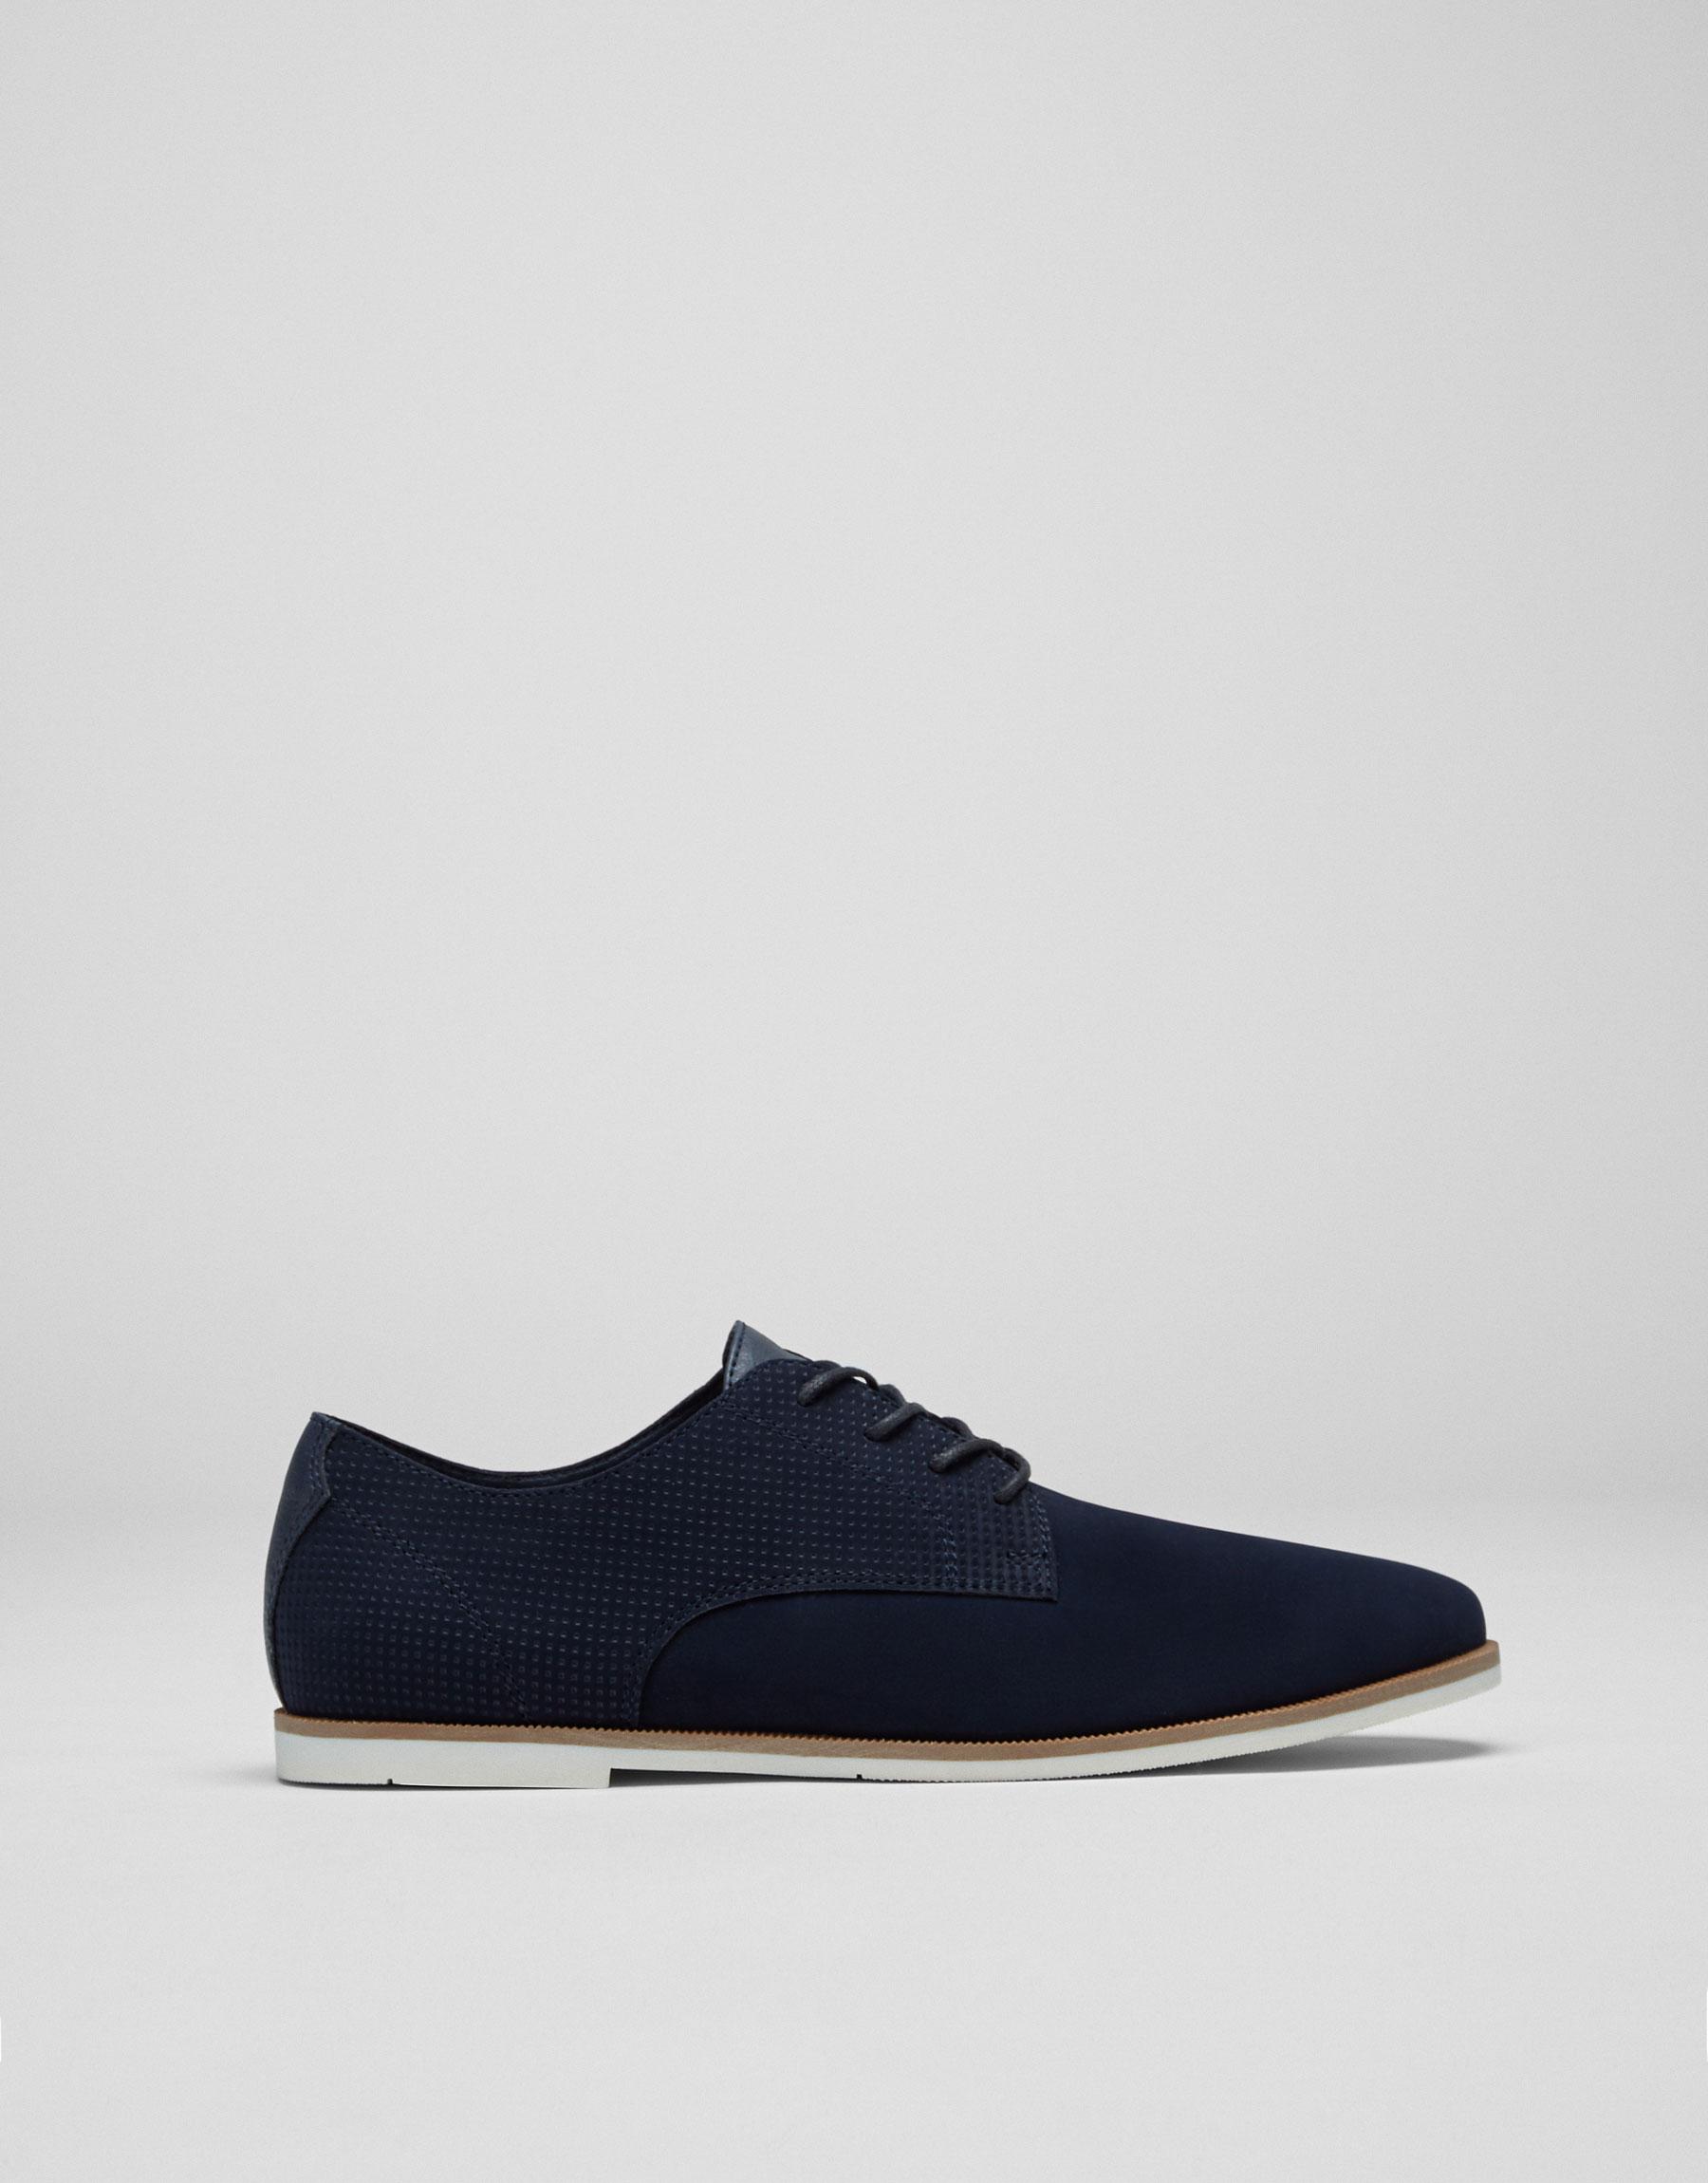 Zapato slim picados